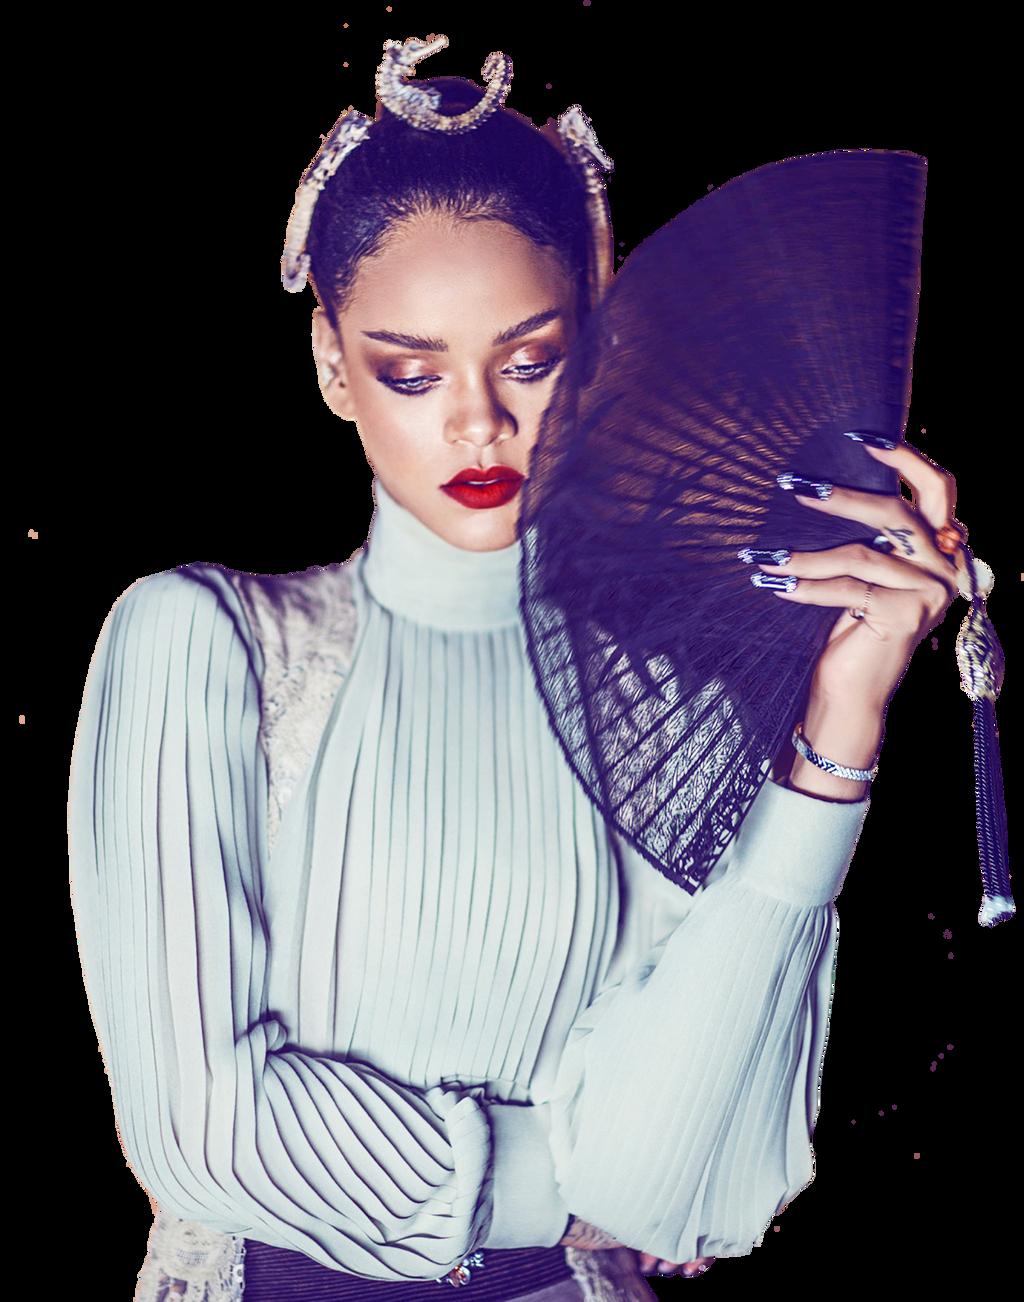 Rihanna Transparent Background >> Rihanna PNG by maarcopngs on DeviantArt